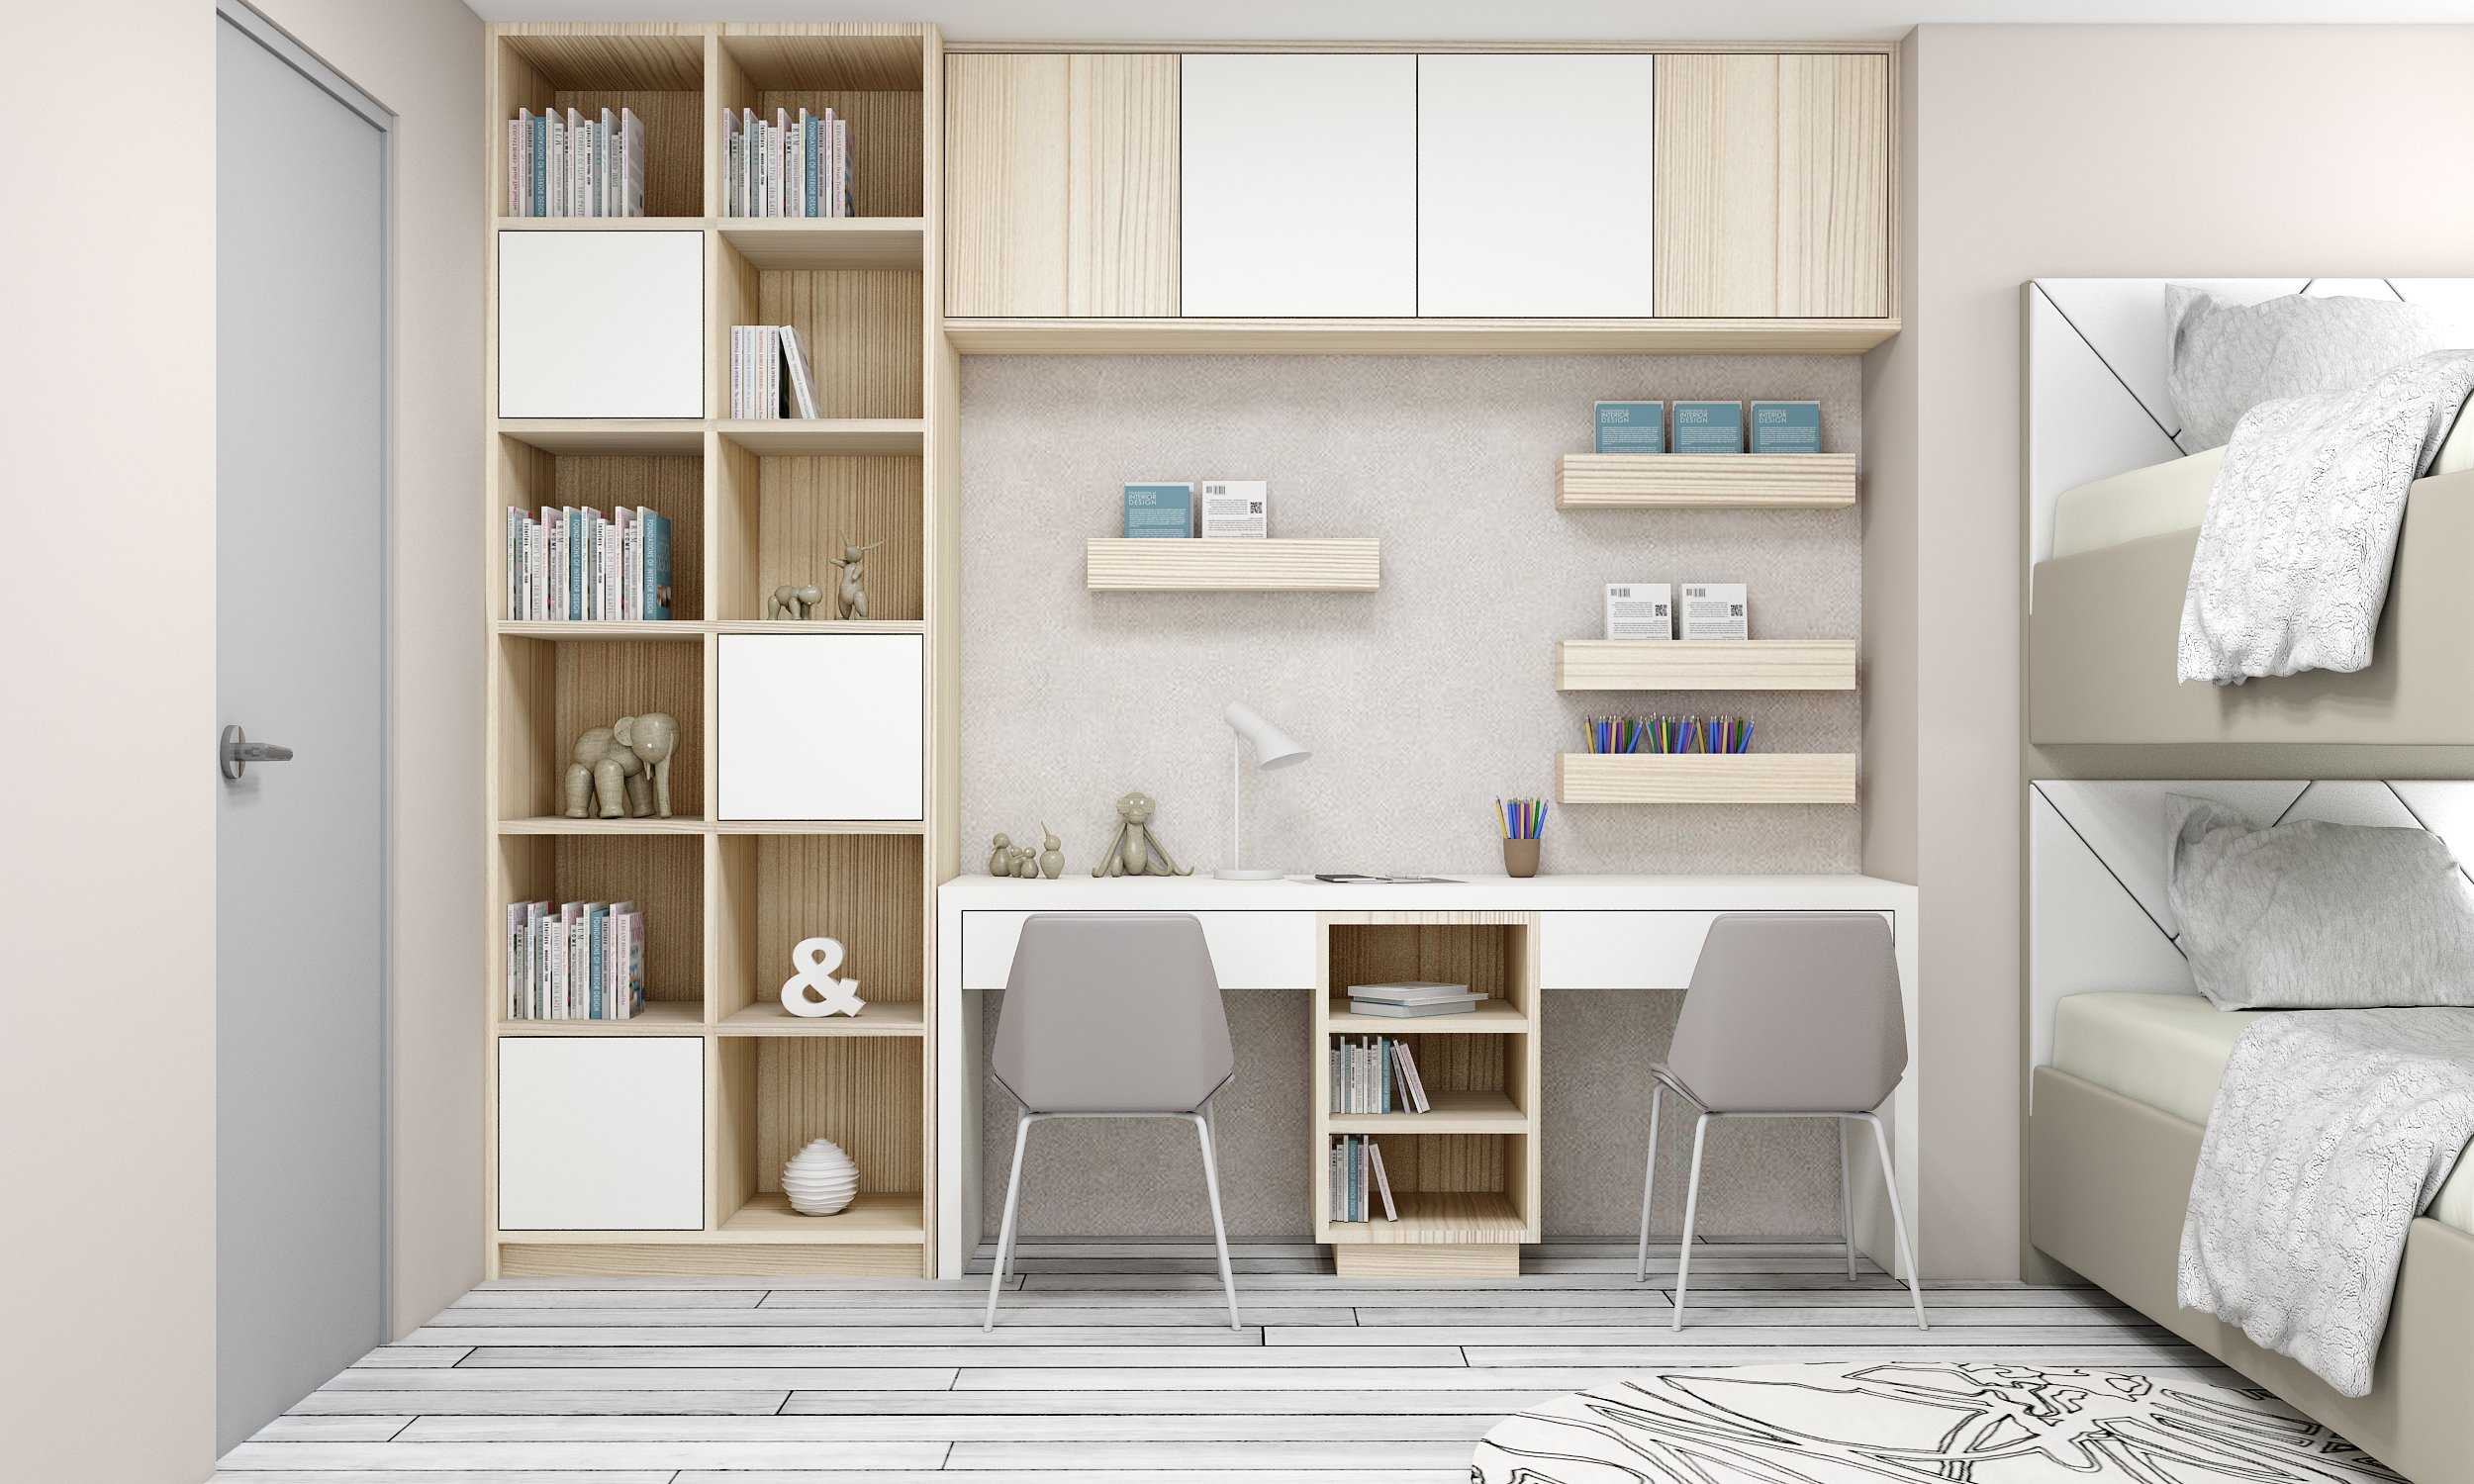 Study Office finished in light woodgrain fleetwood finish and White matt